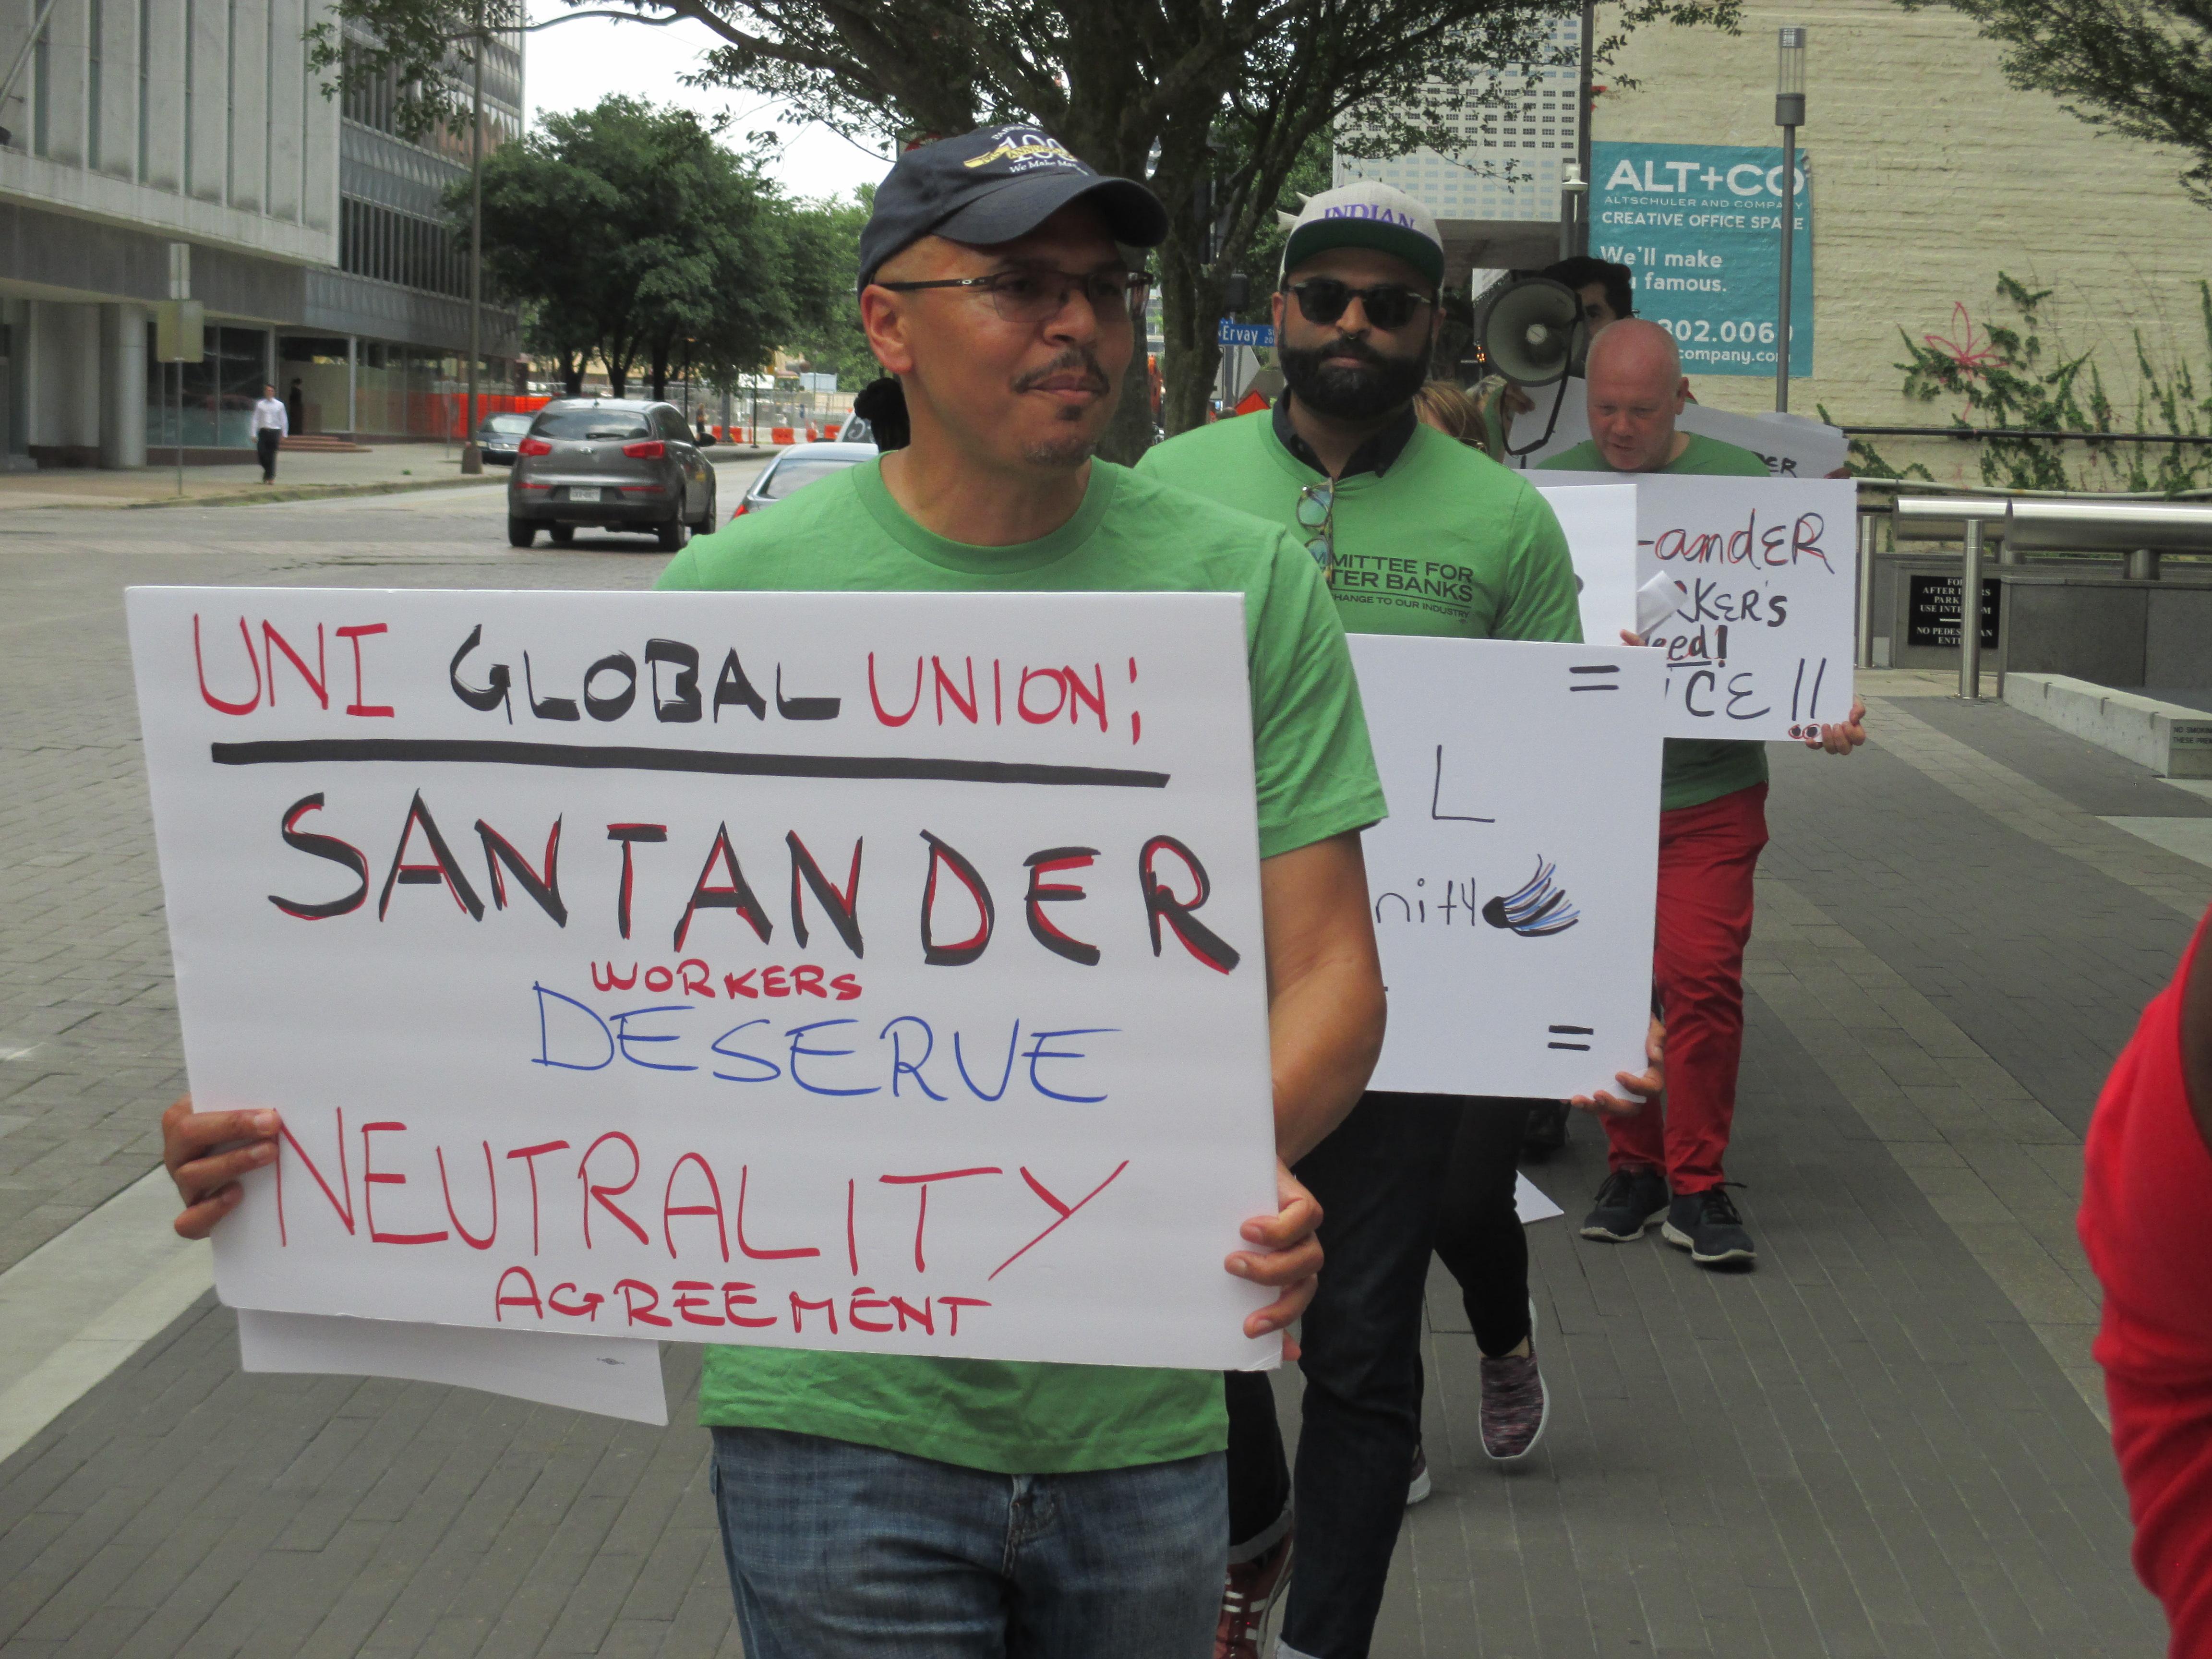 Santander Action